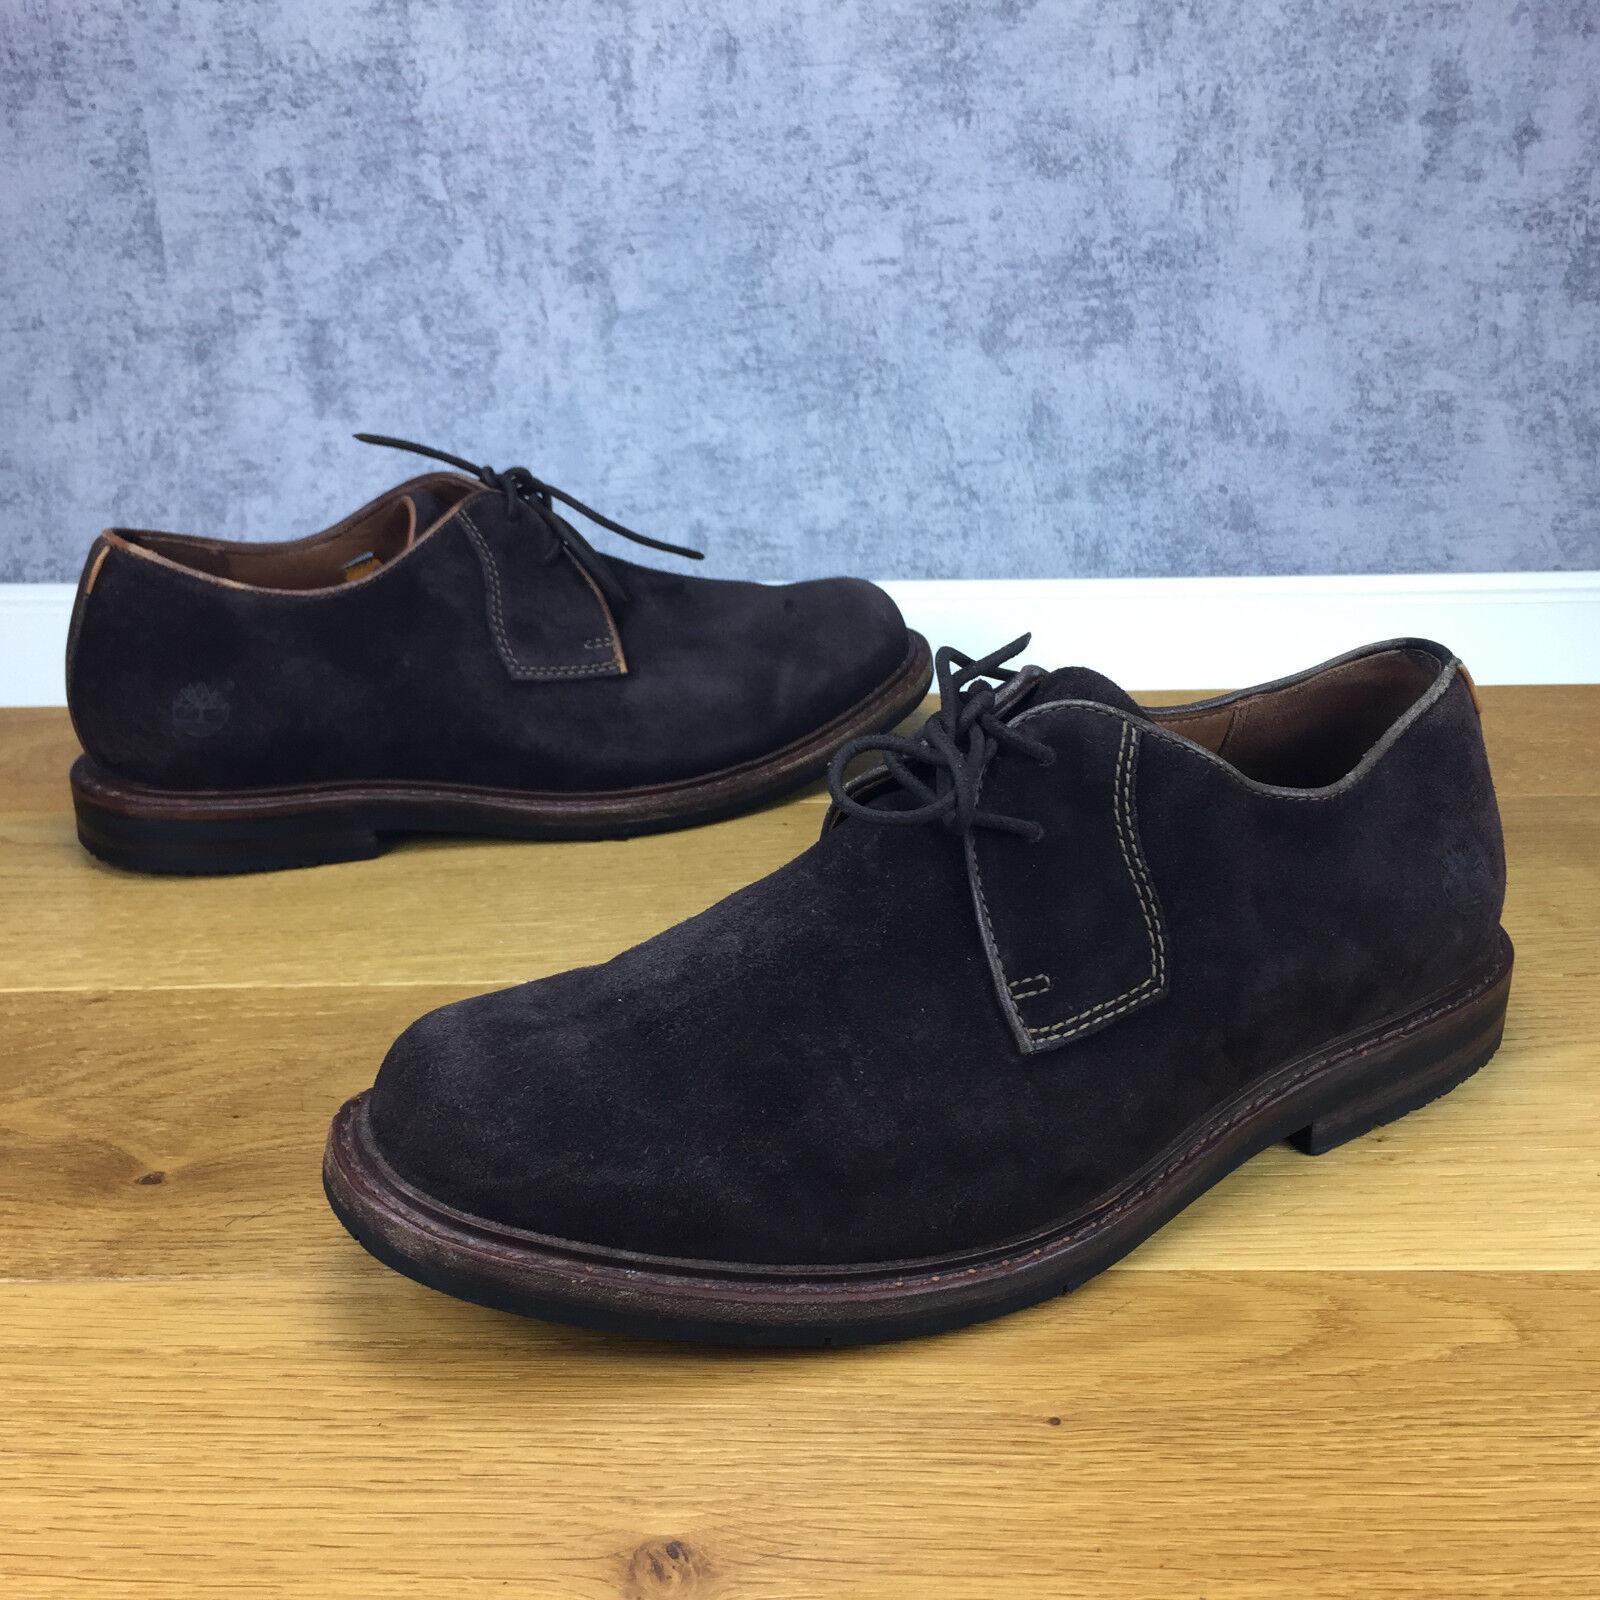 TIMBERLAND SCHUHE 45,5 (Z34014-175-2954) HERREN Stiefel LEDERSCHUHE SCHNÜRSCHUHE     Qualität Produkte